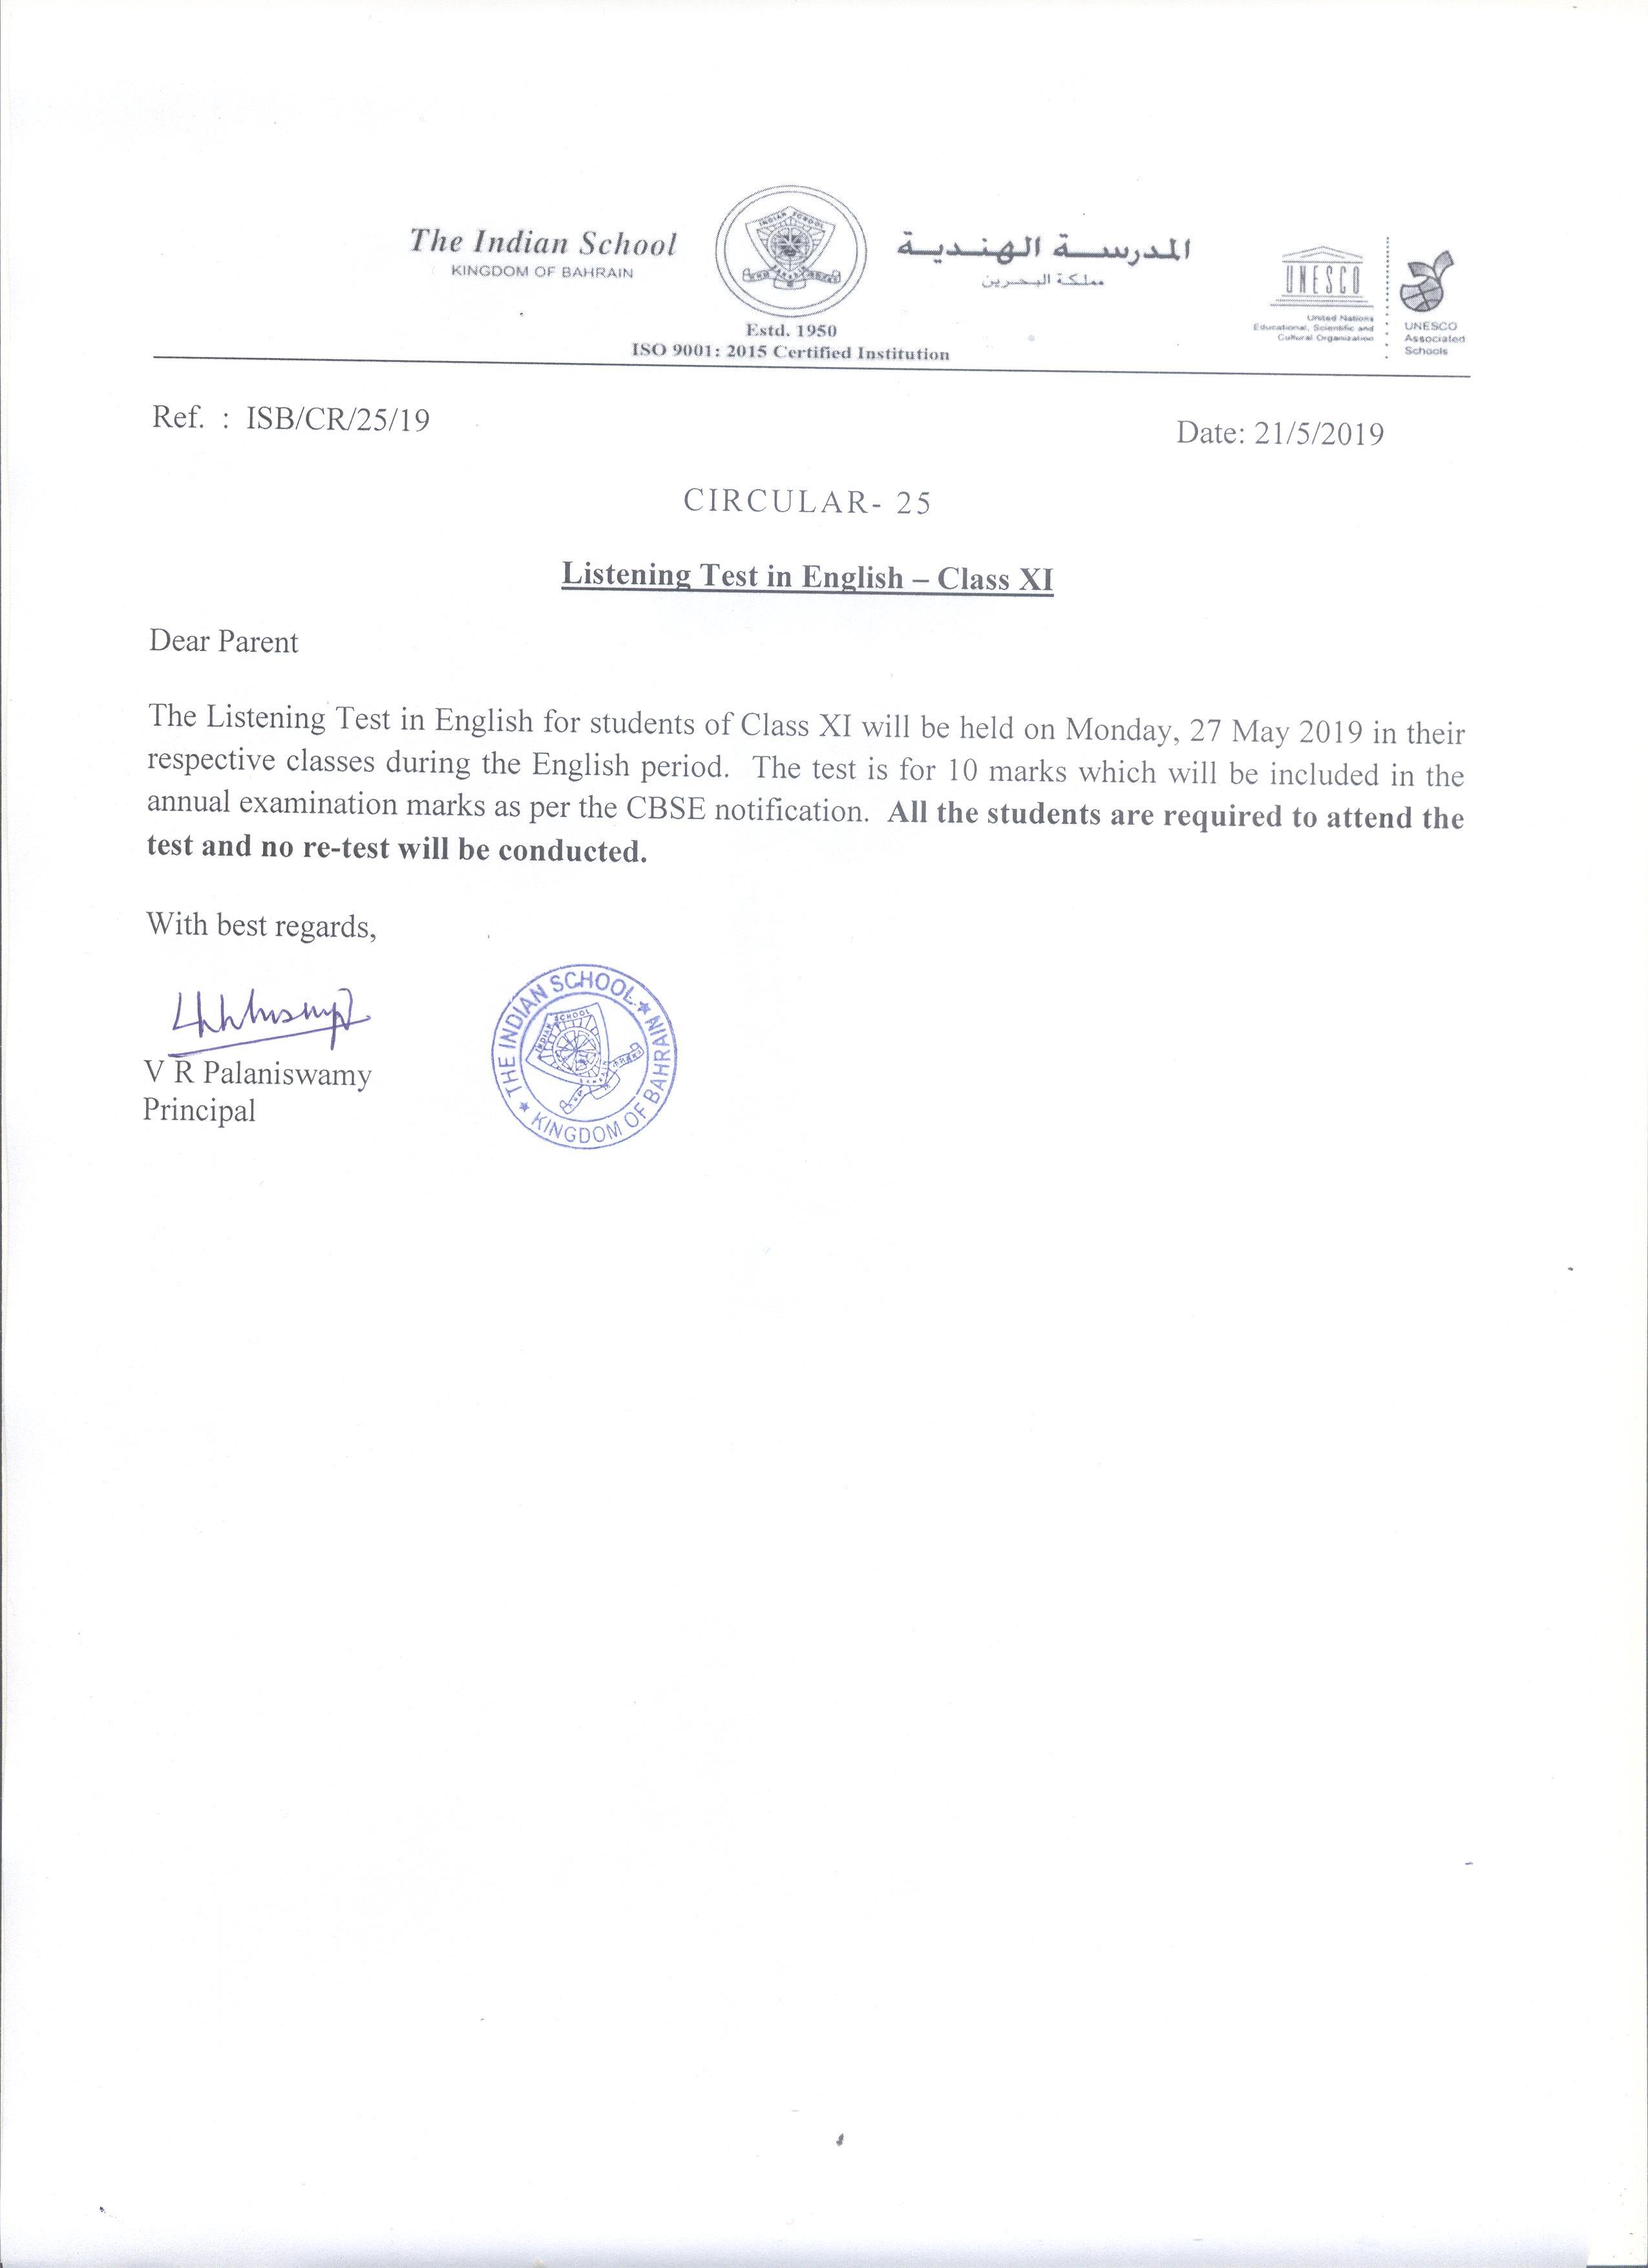 Circulars - The Indian School, Bahrain